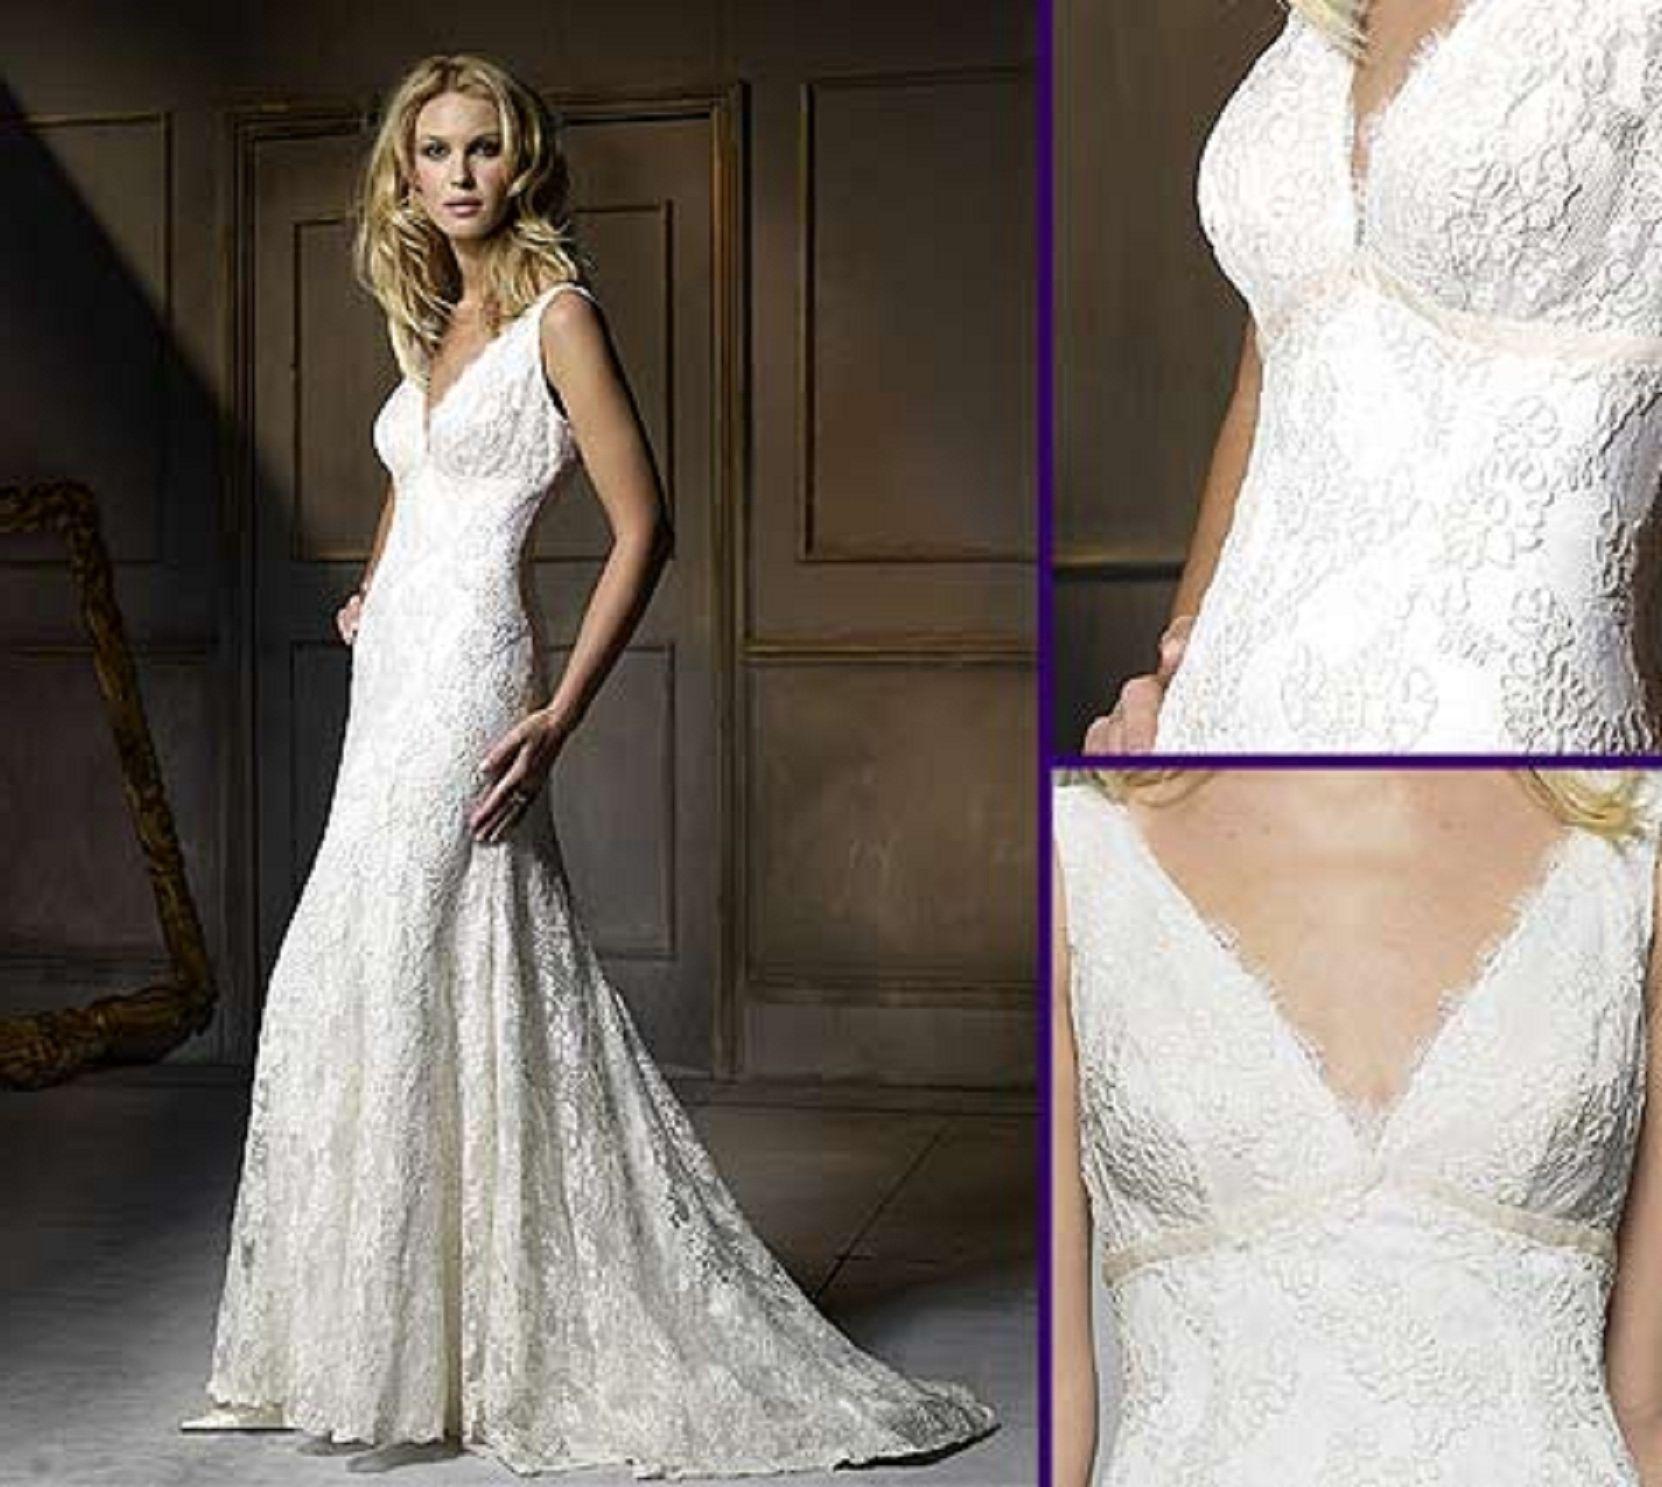 Vintage Lace Wedding Gowns Brisbane | Wedding Dress | Pinterest ...